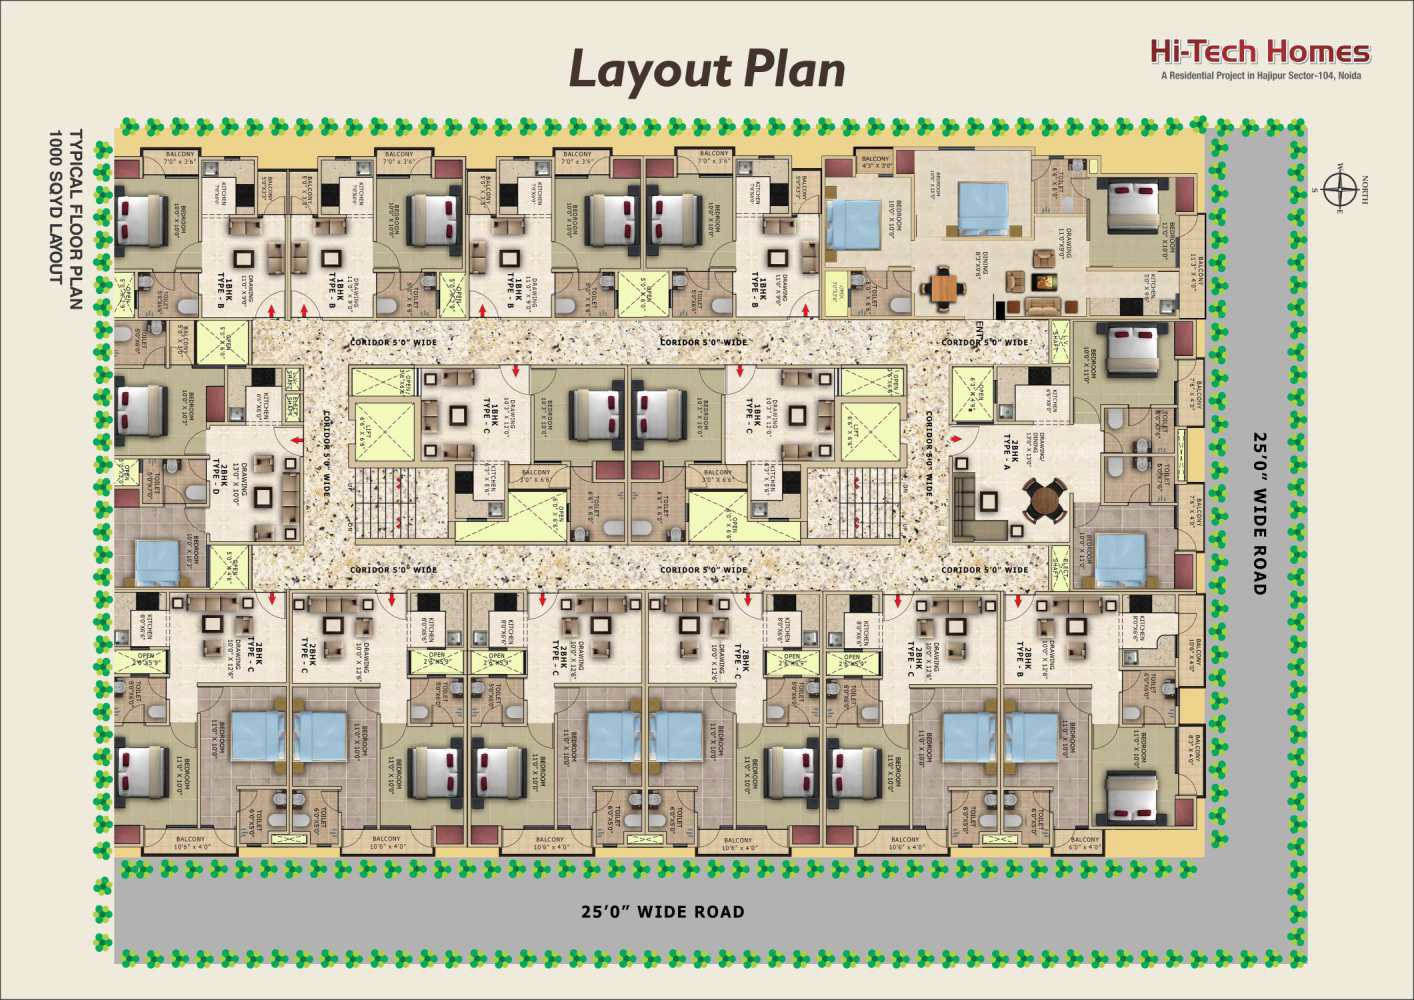 master-plan-image-Picture-buildlopers-hi-tech-homes-2752611